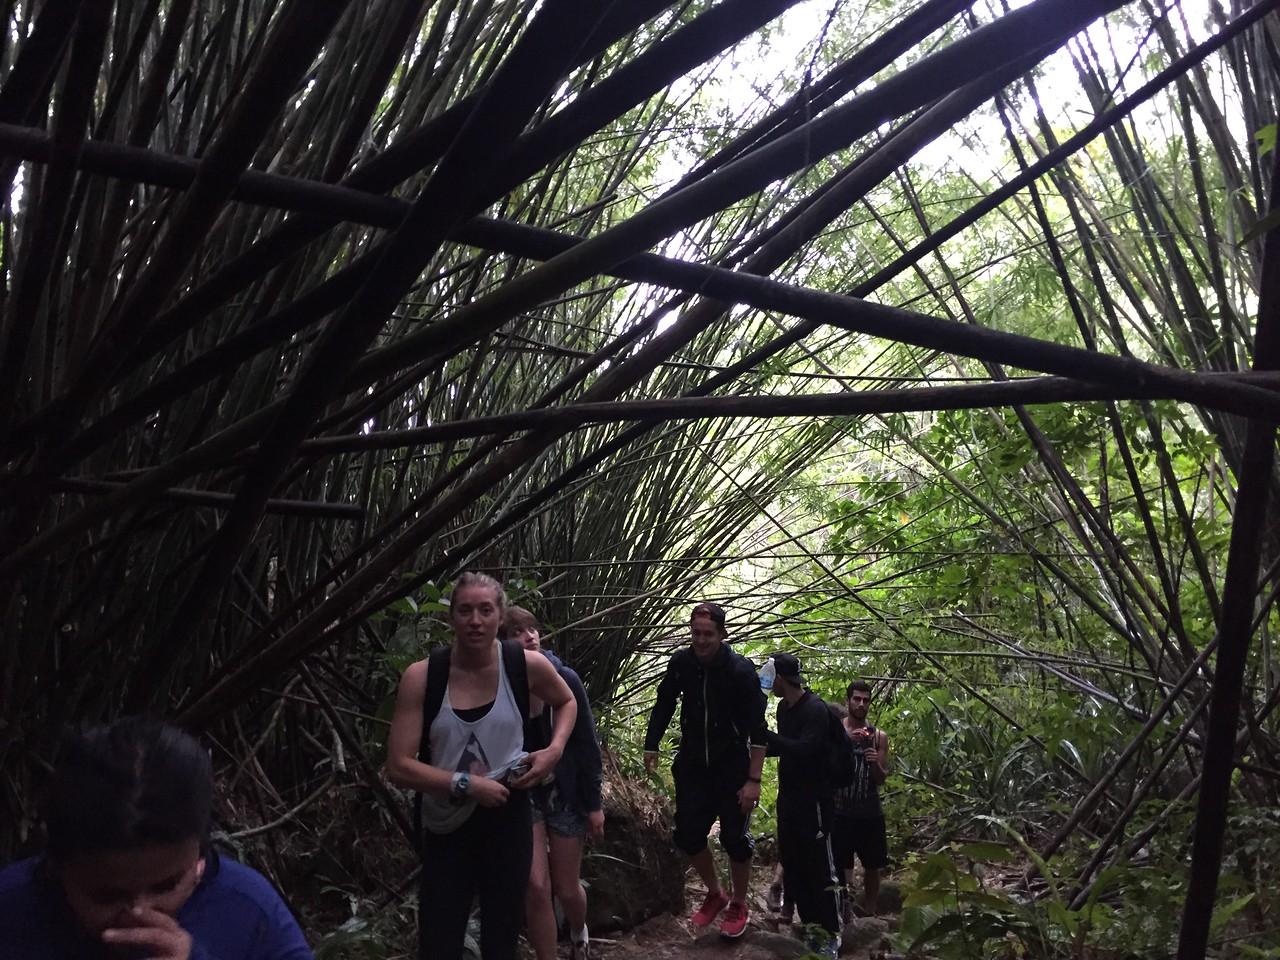 HI Hostel group on trek at Ilha Grande (Big Island), rio de Janeiro, Brazil